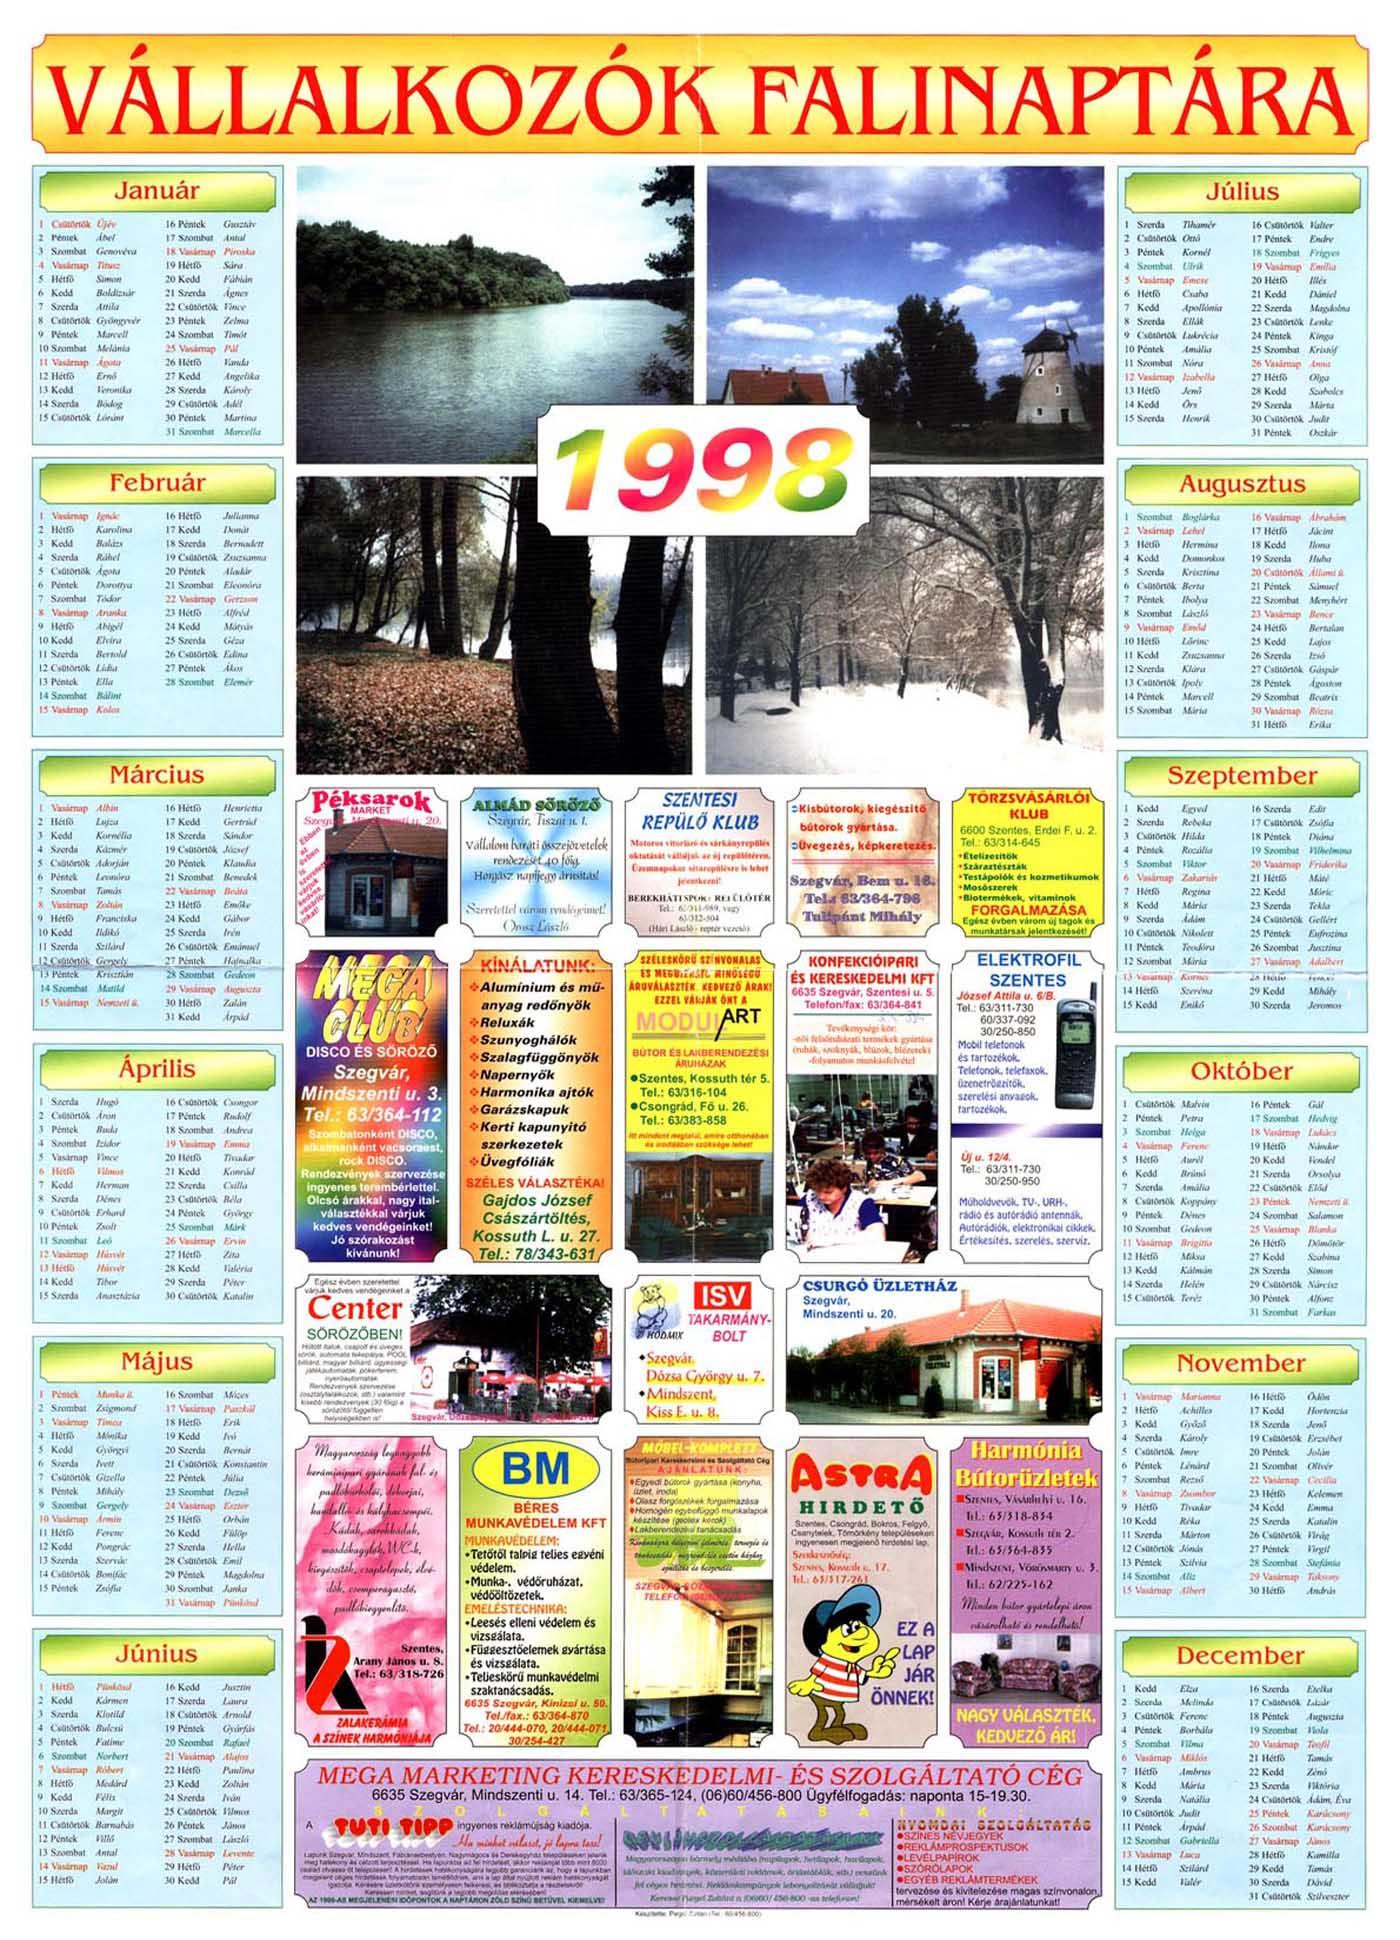 02-VallalkozokFalinaptara1998-1997